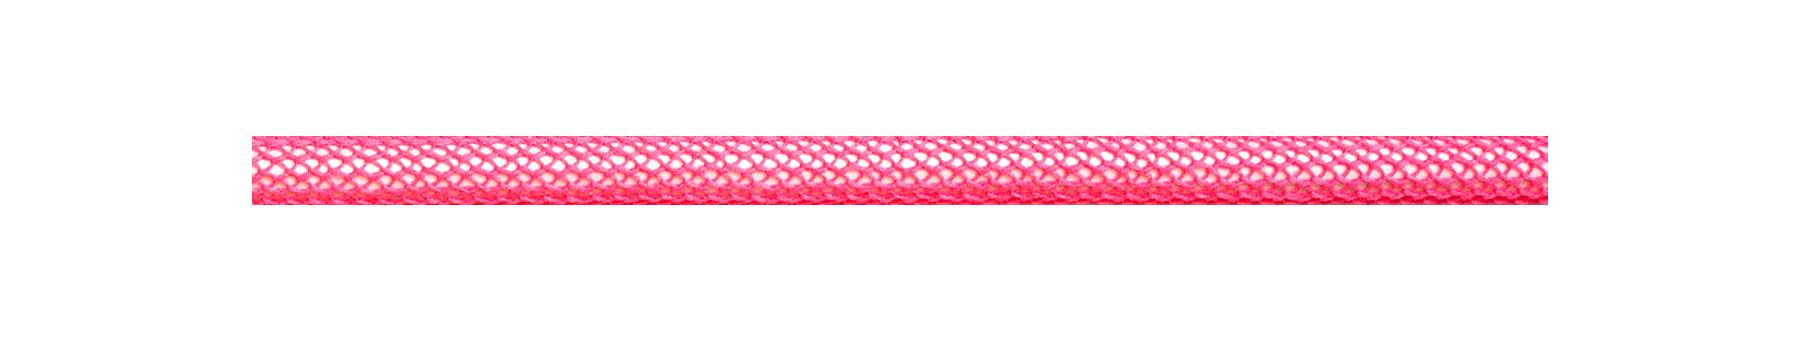 Textilkabel Neon Pink Netzartiger Textilmantel